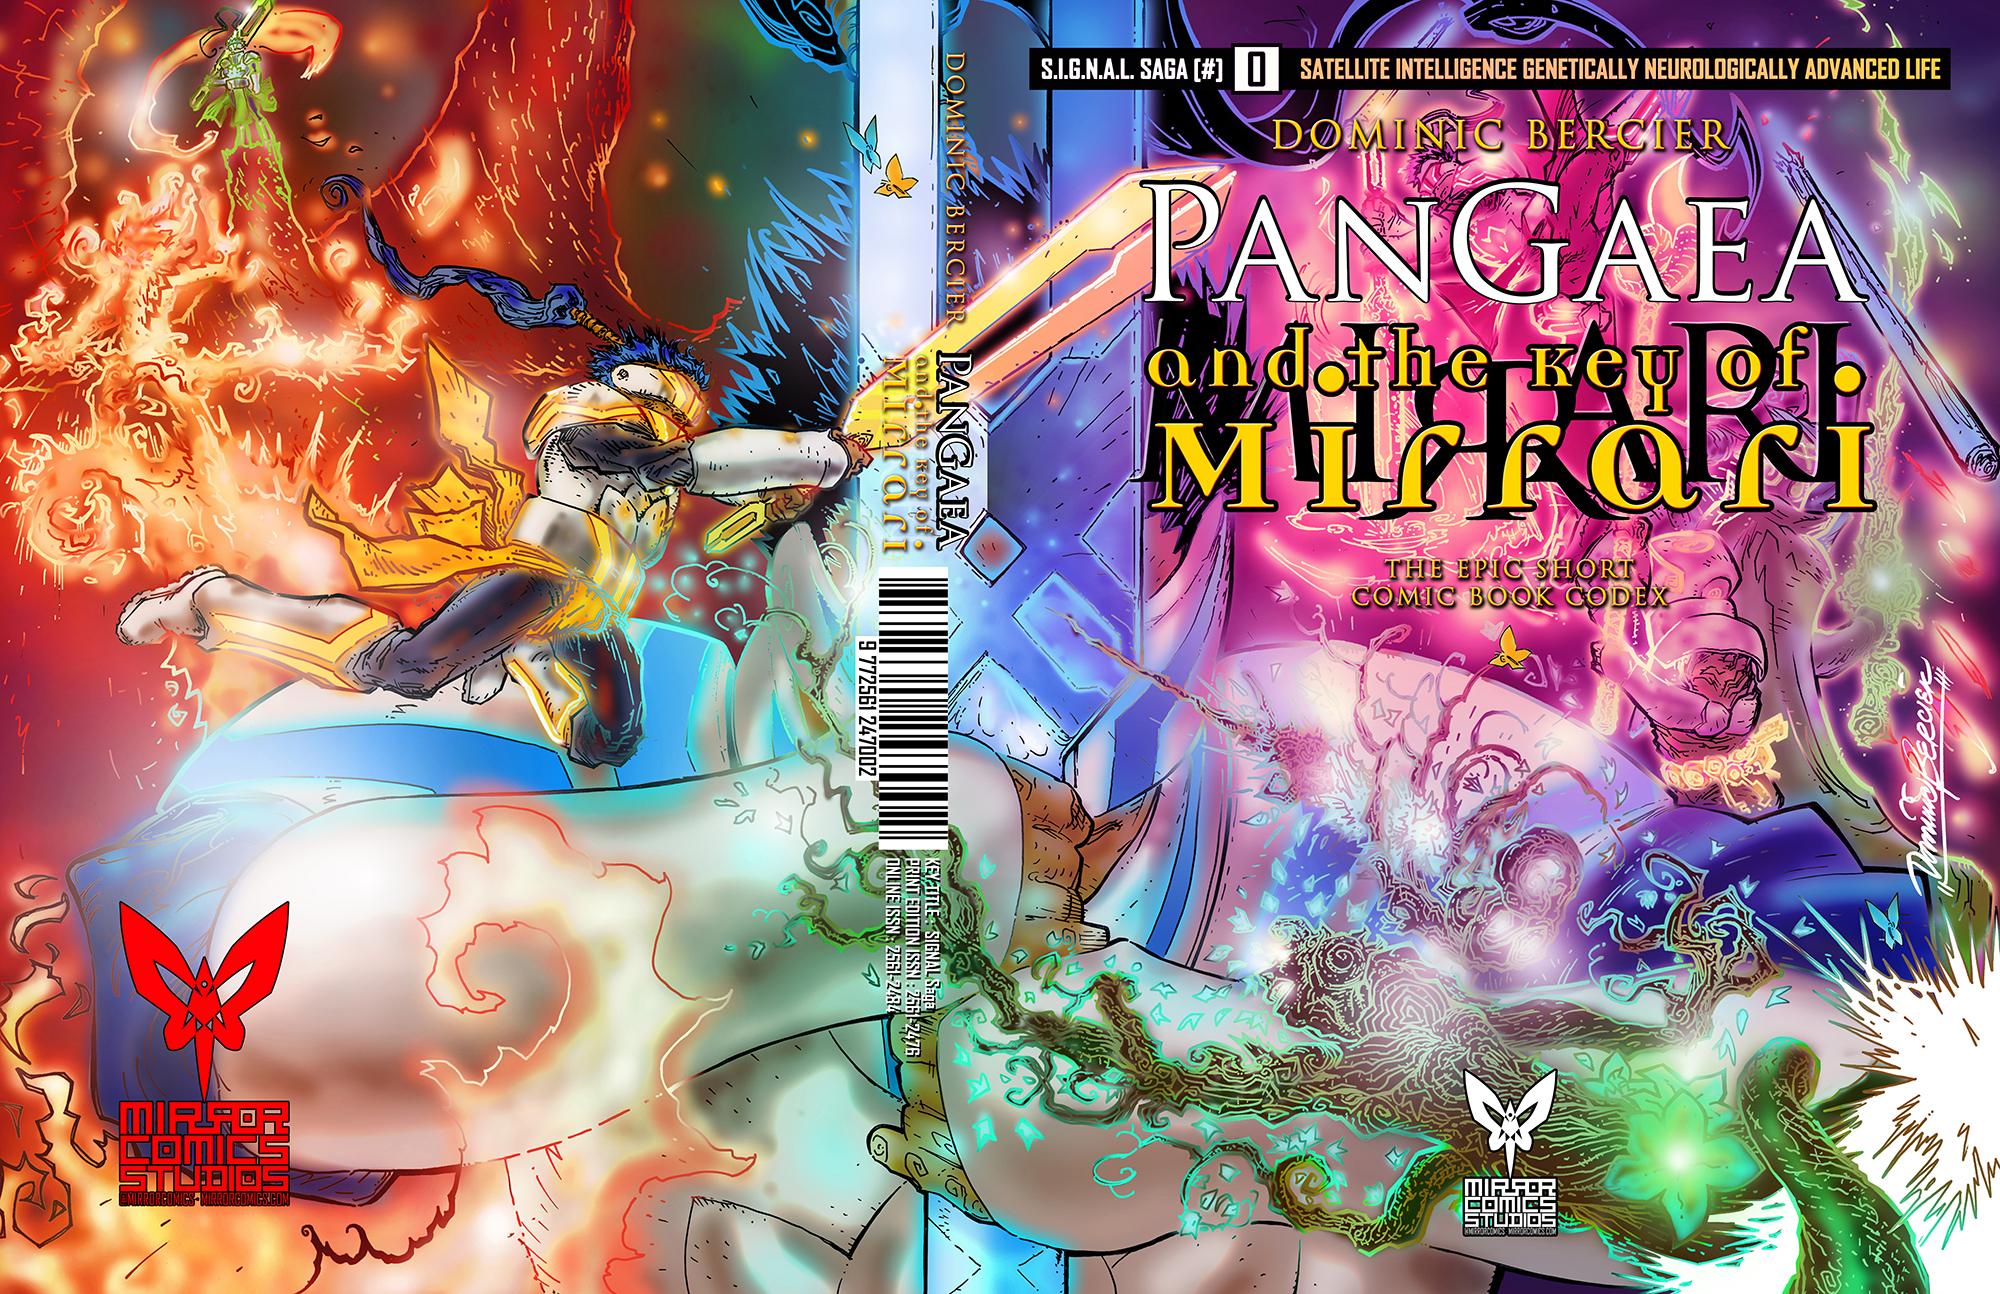 Comic book cover of SIGNAL Saga #0 - PanGaea and the Key of Mirrari by Dominic Bercier [2017]